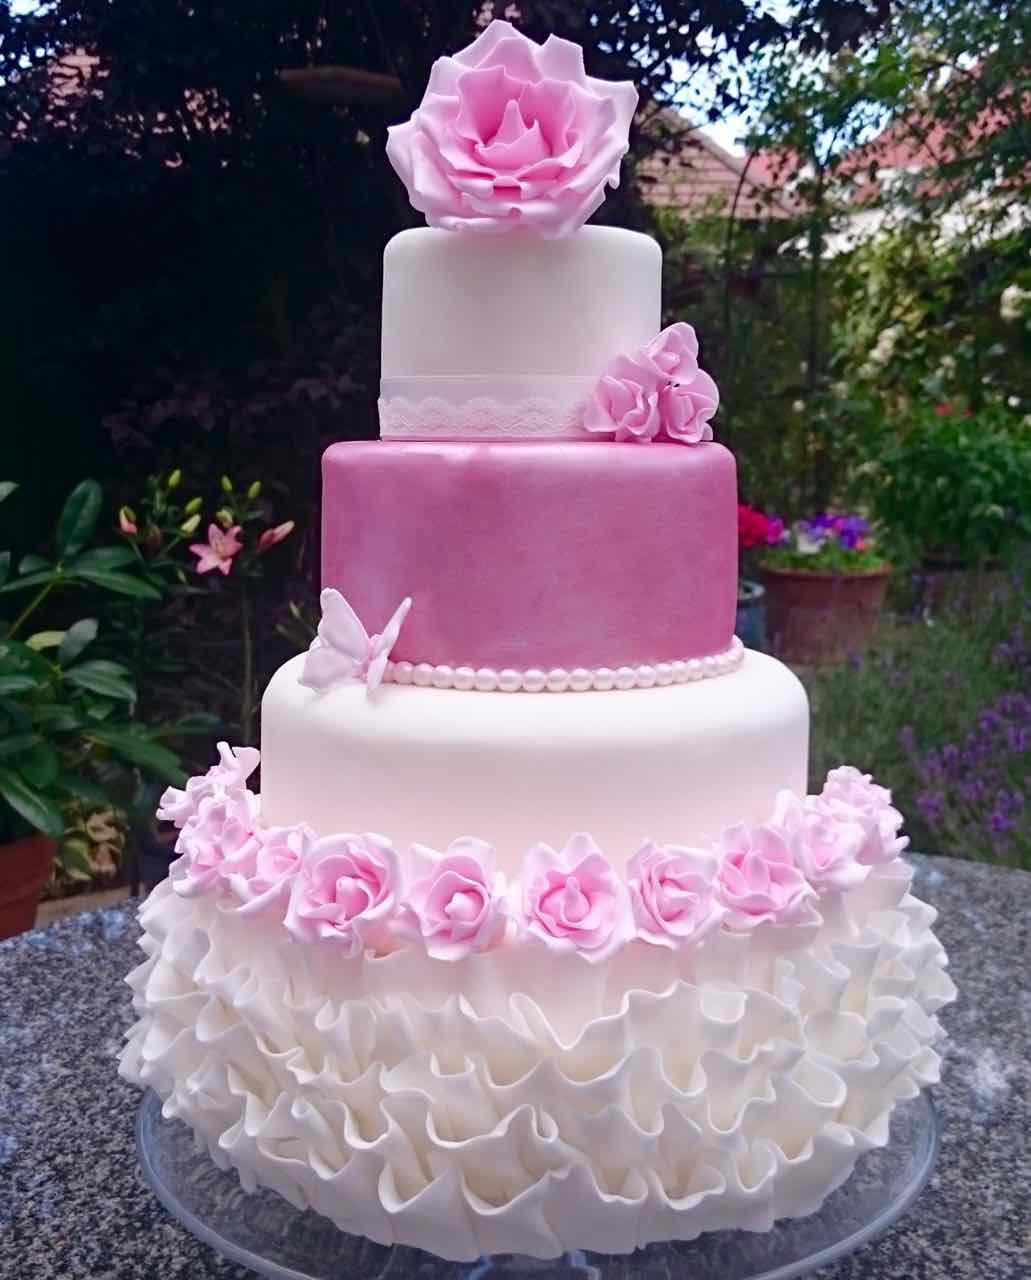 pink rose and ruffle wedding cake - Serendipity Cake Company